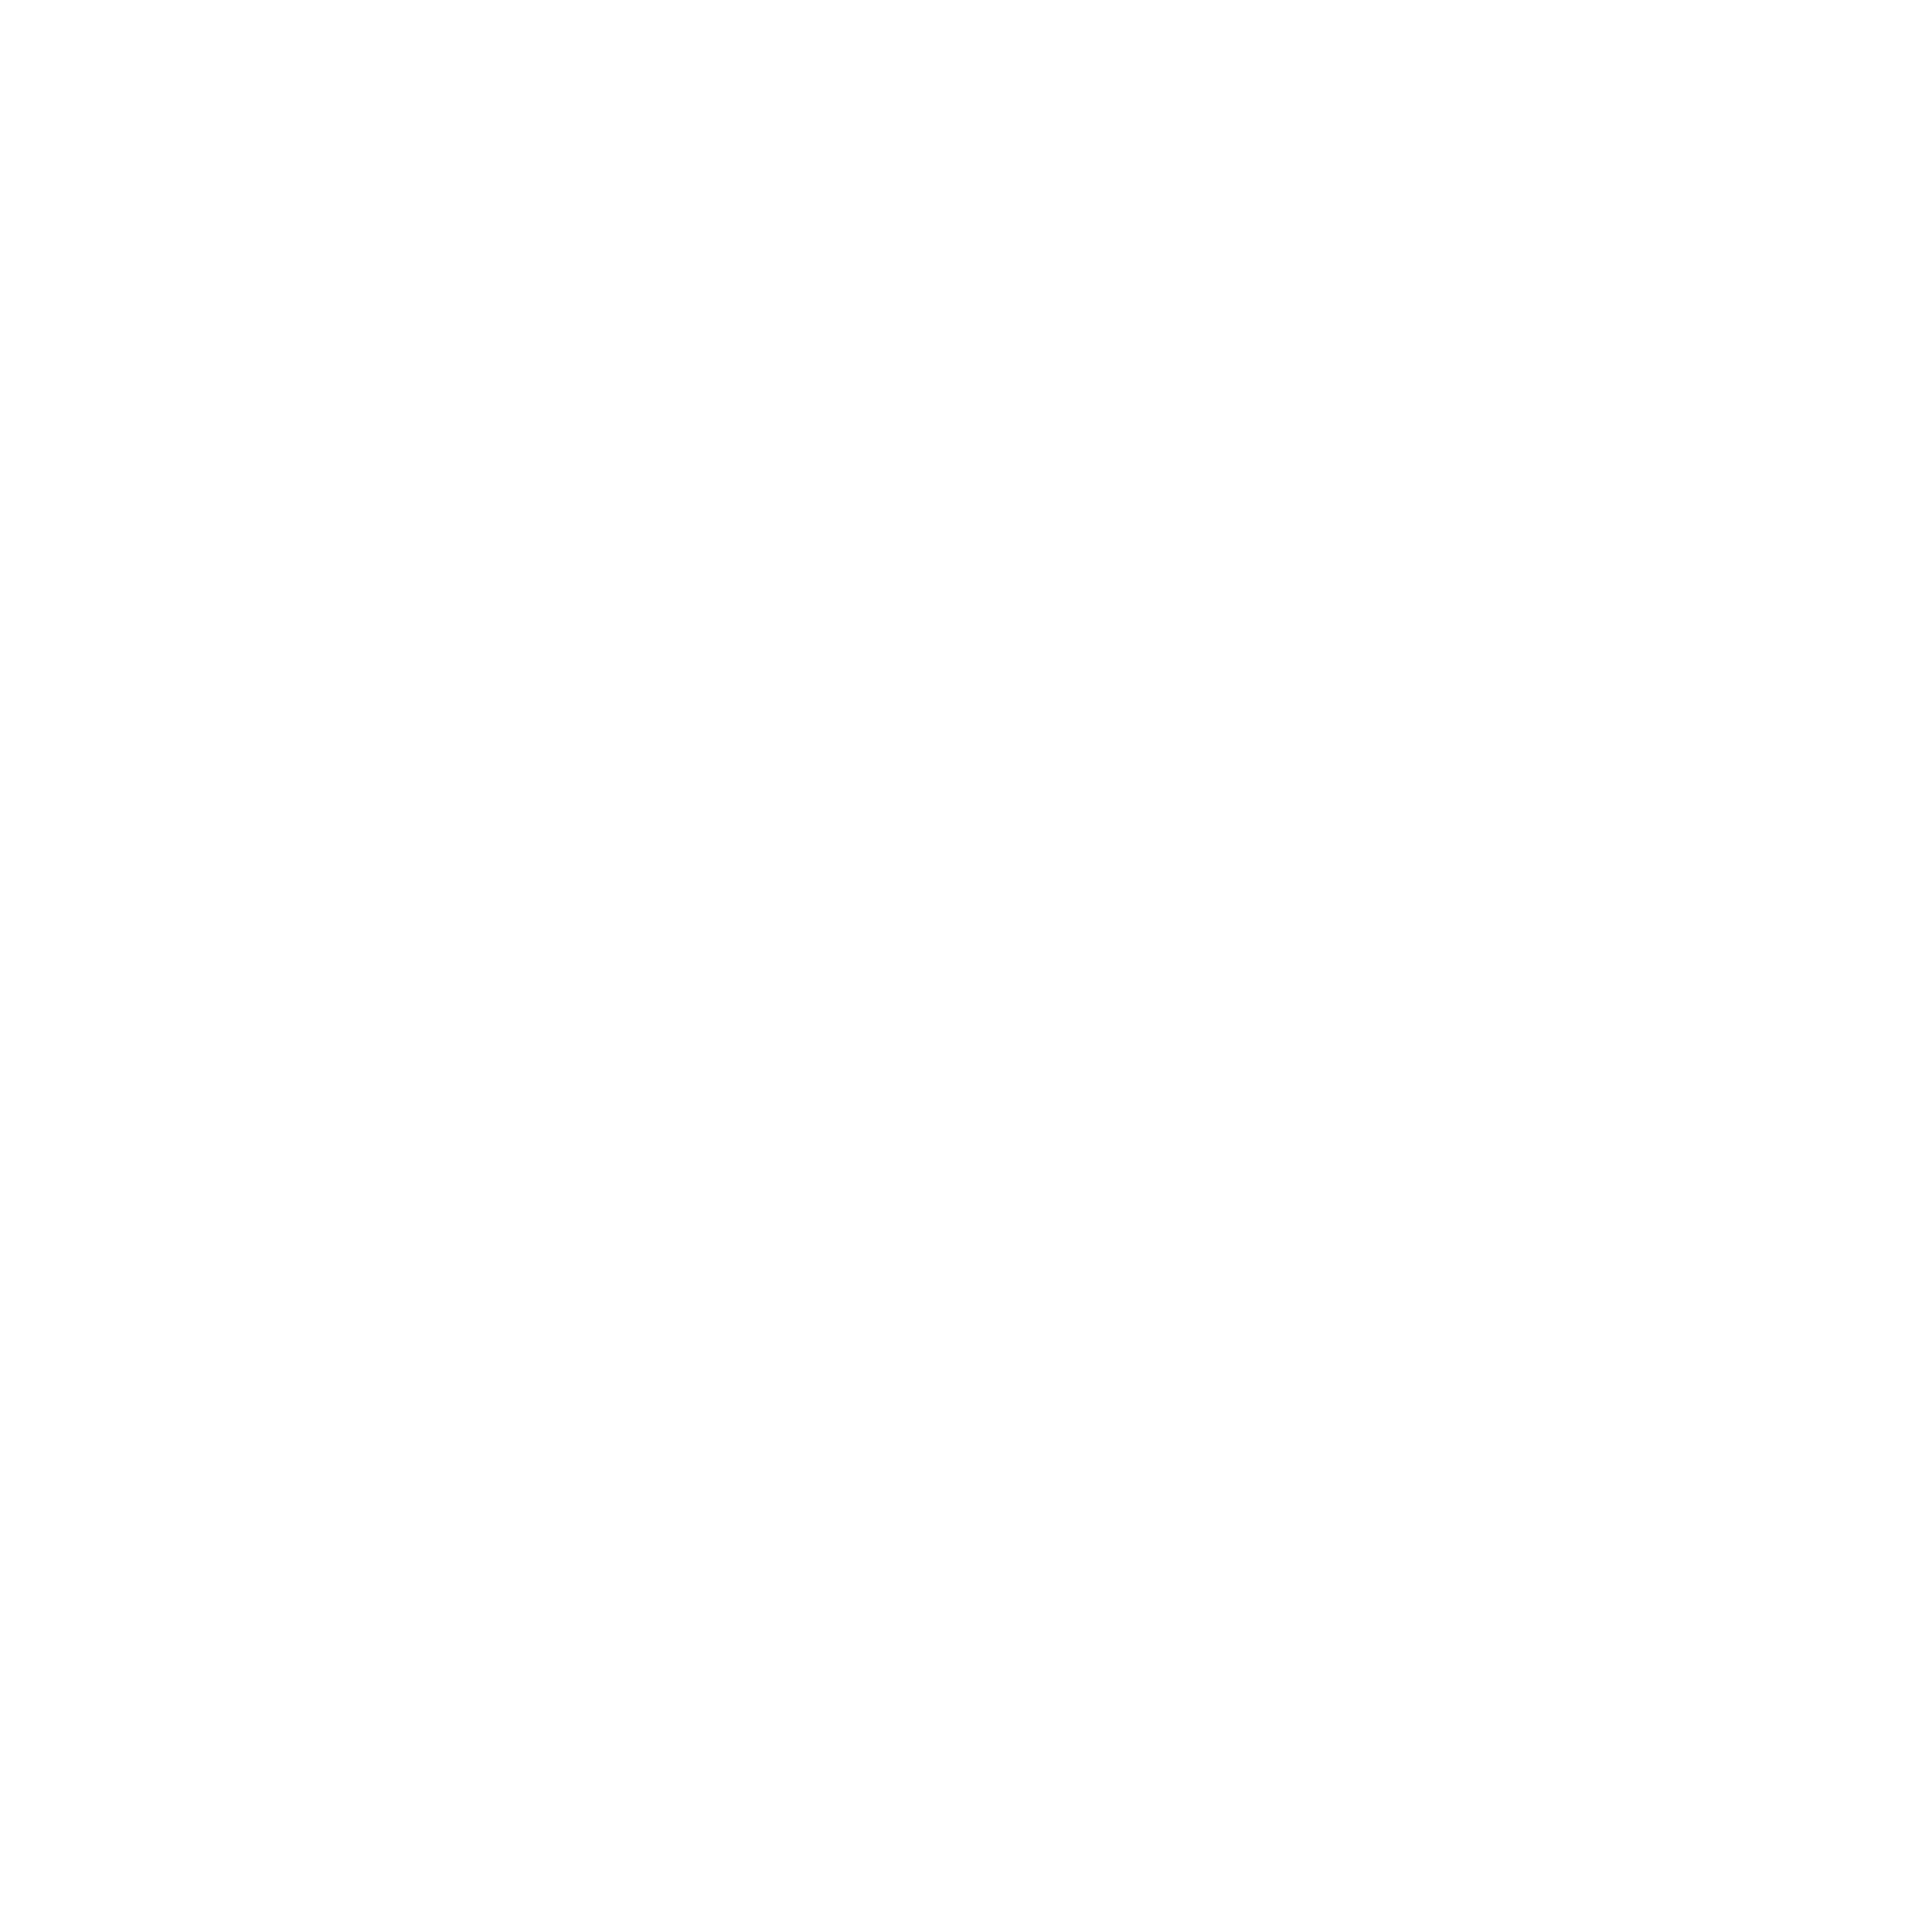 MK Madkunst